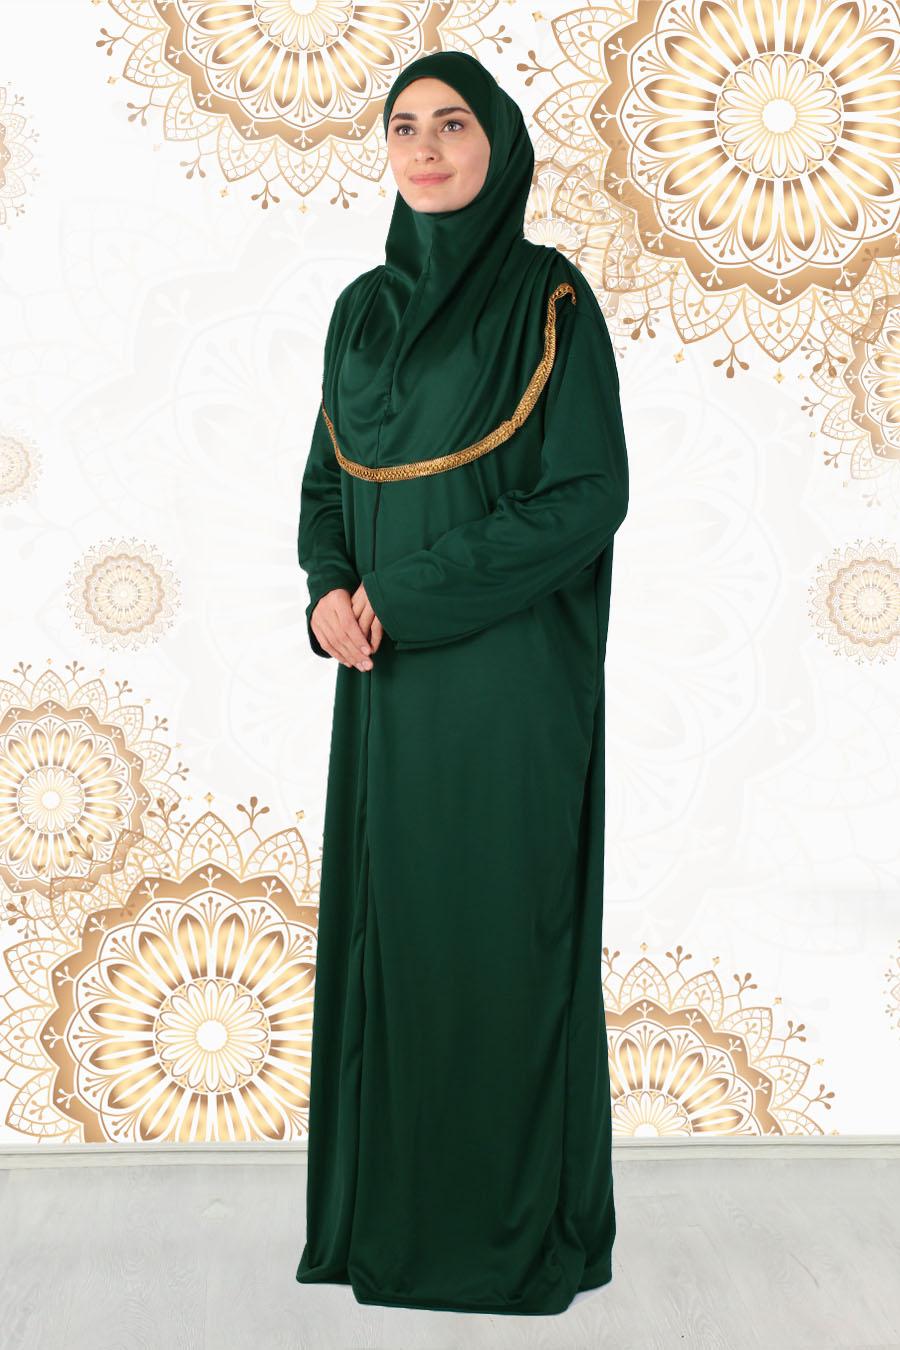 PRAYER DRESS